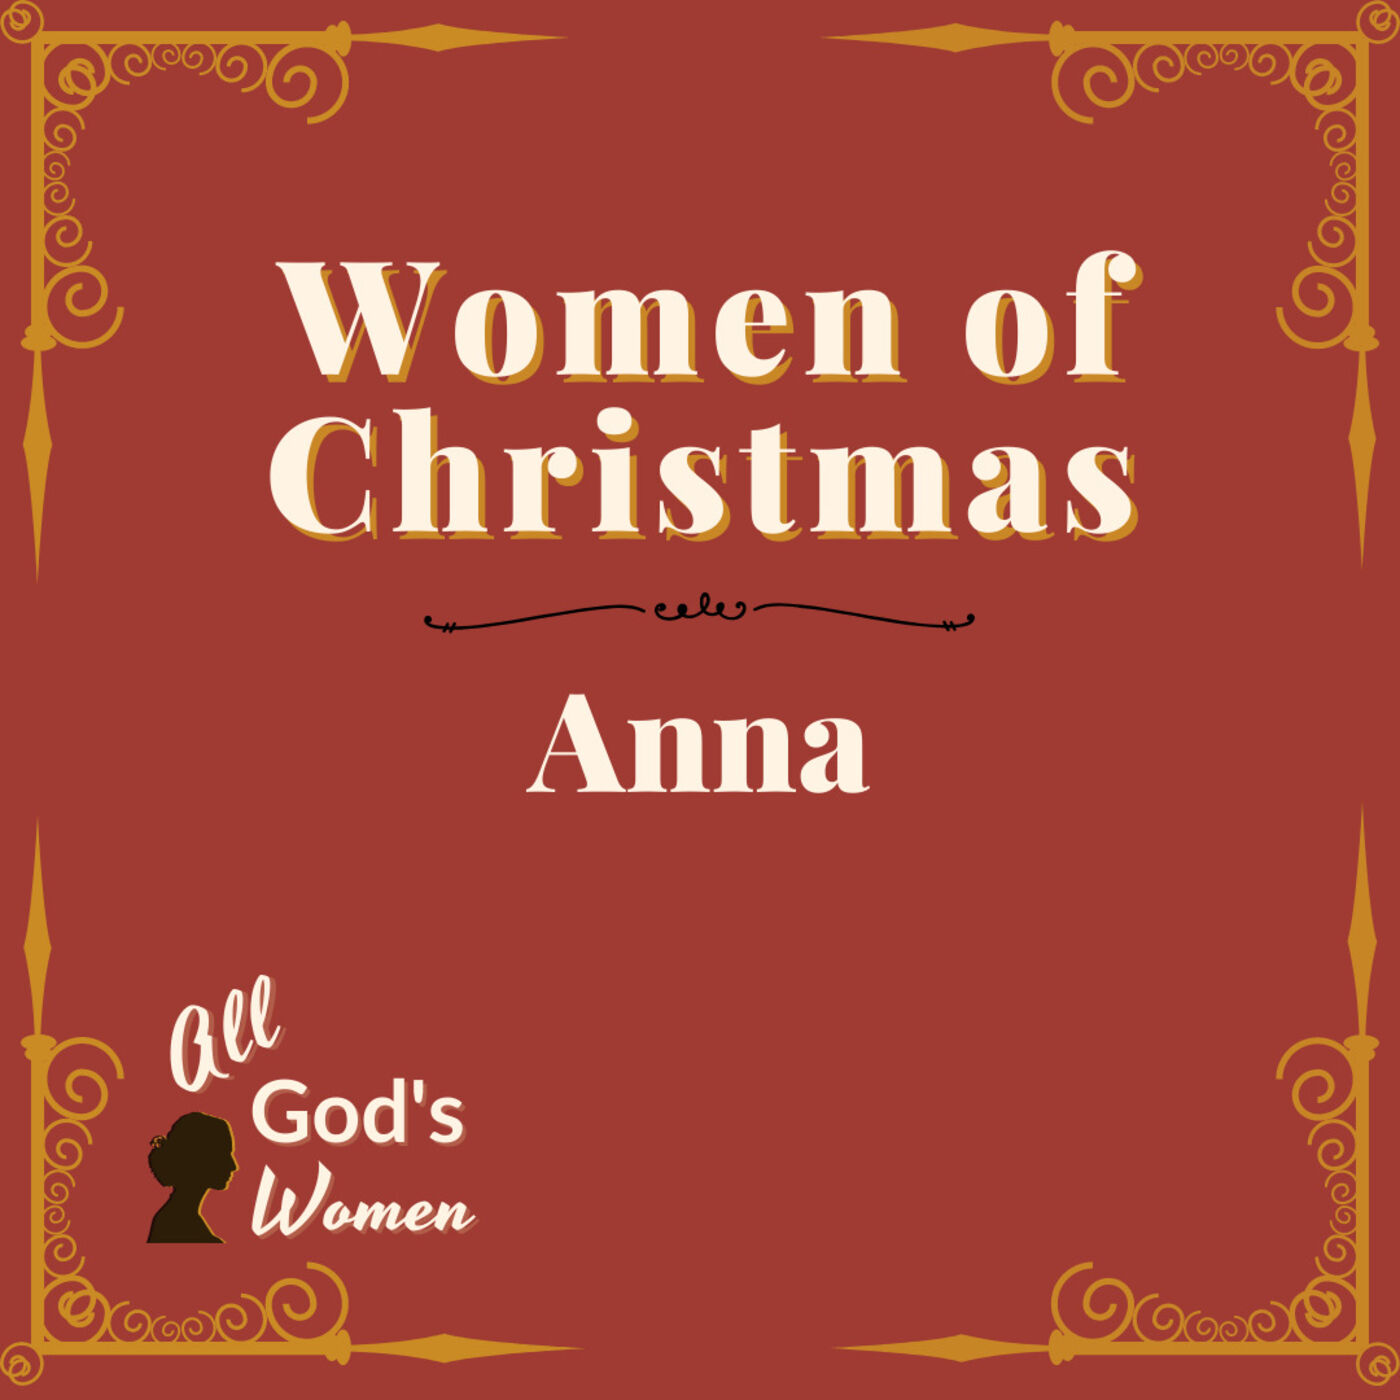 Women of Christmas - Anna